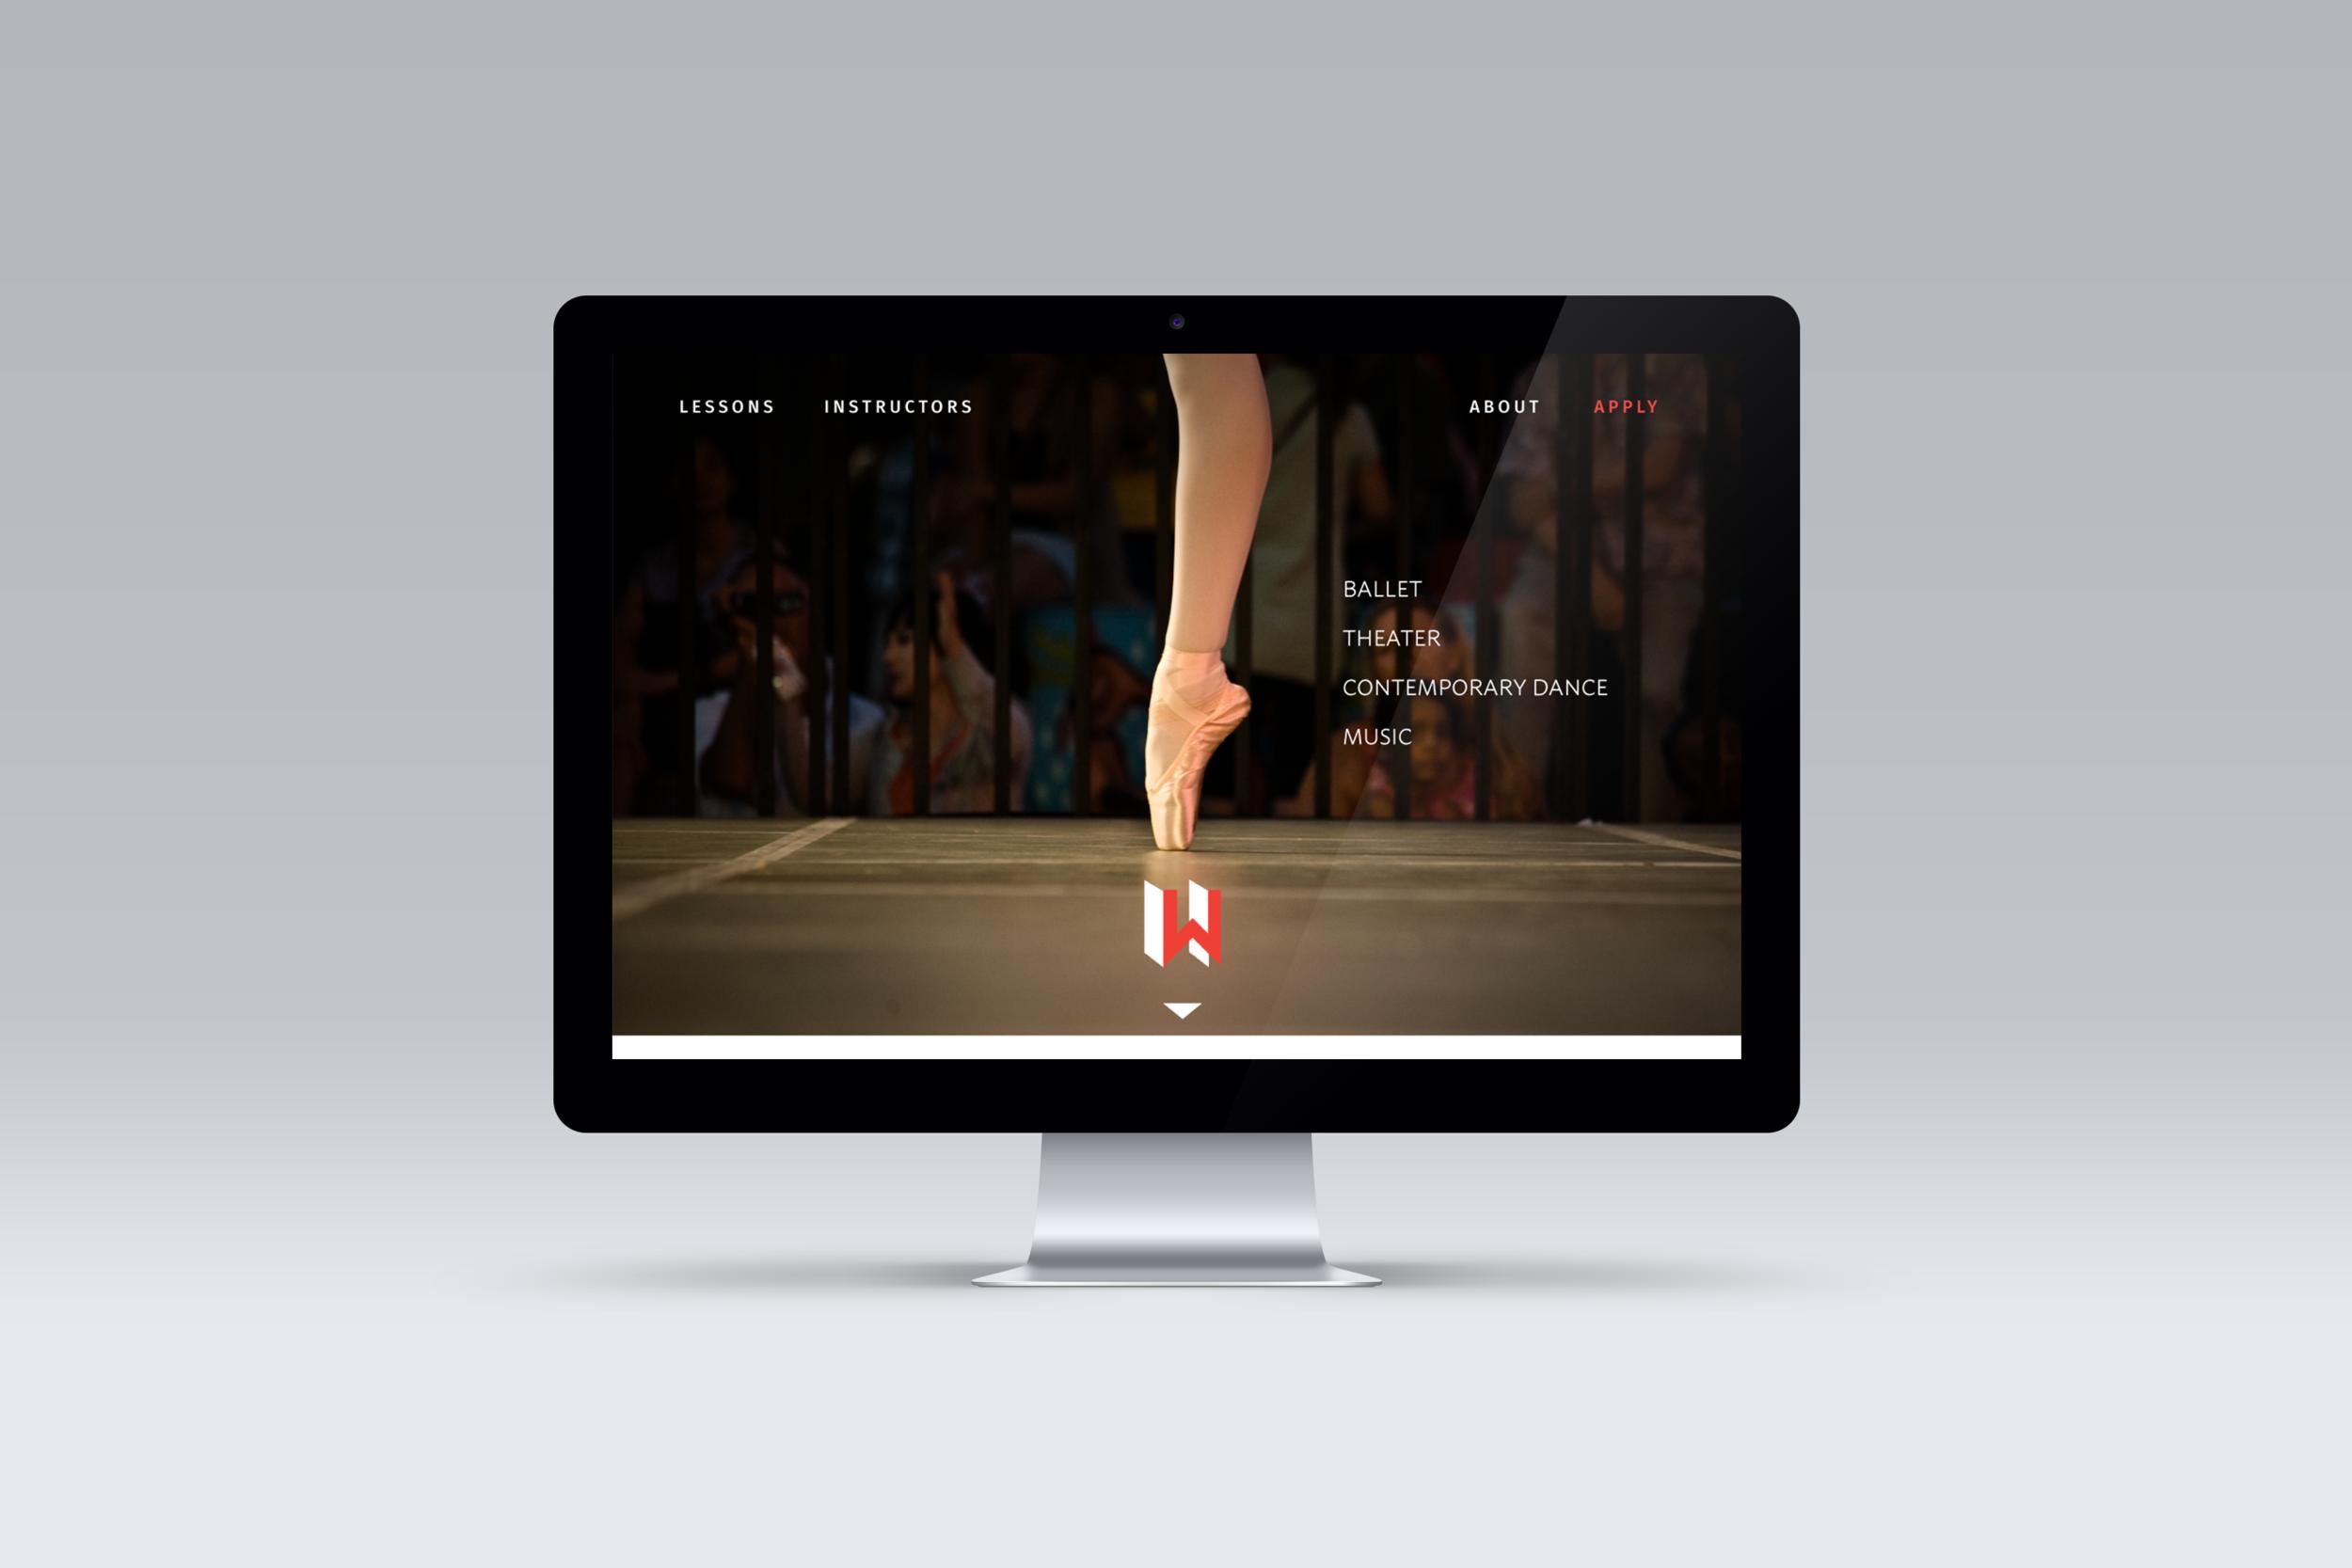 Main website landing page on desktop display